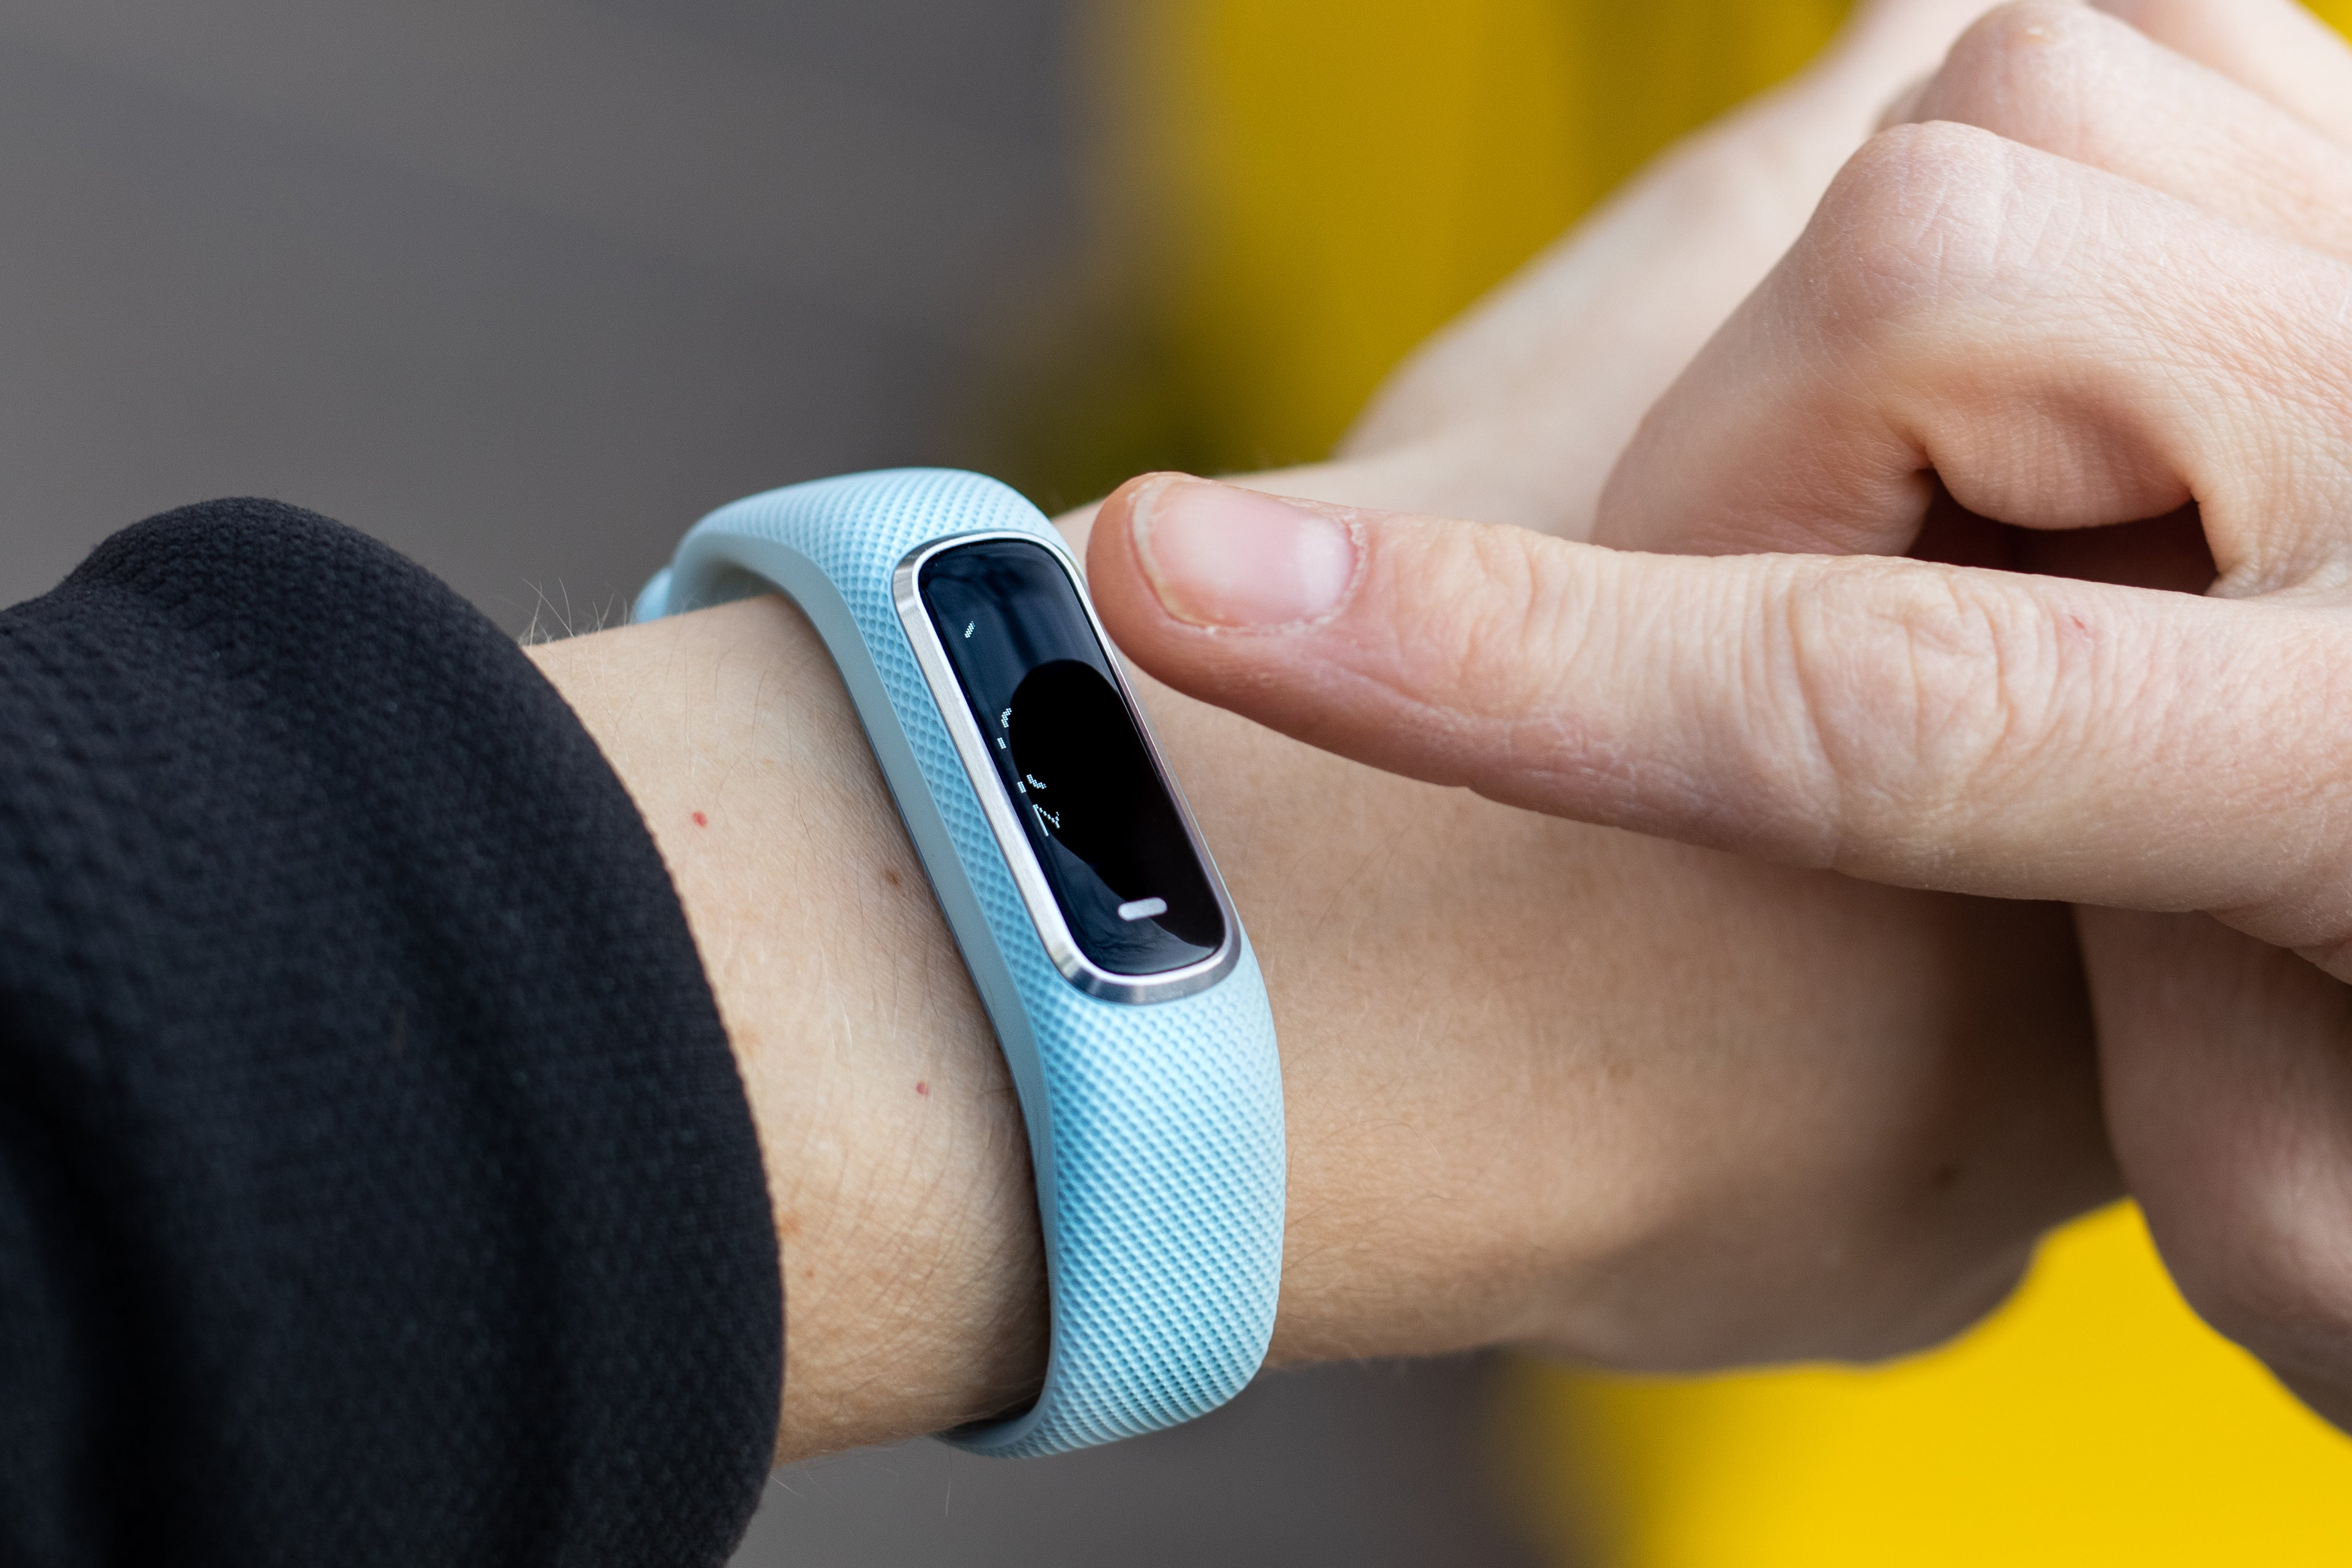 Vívosmart 4's touchscreen